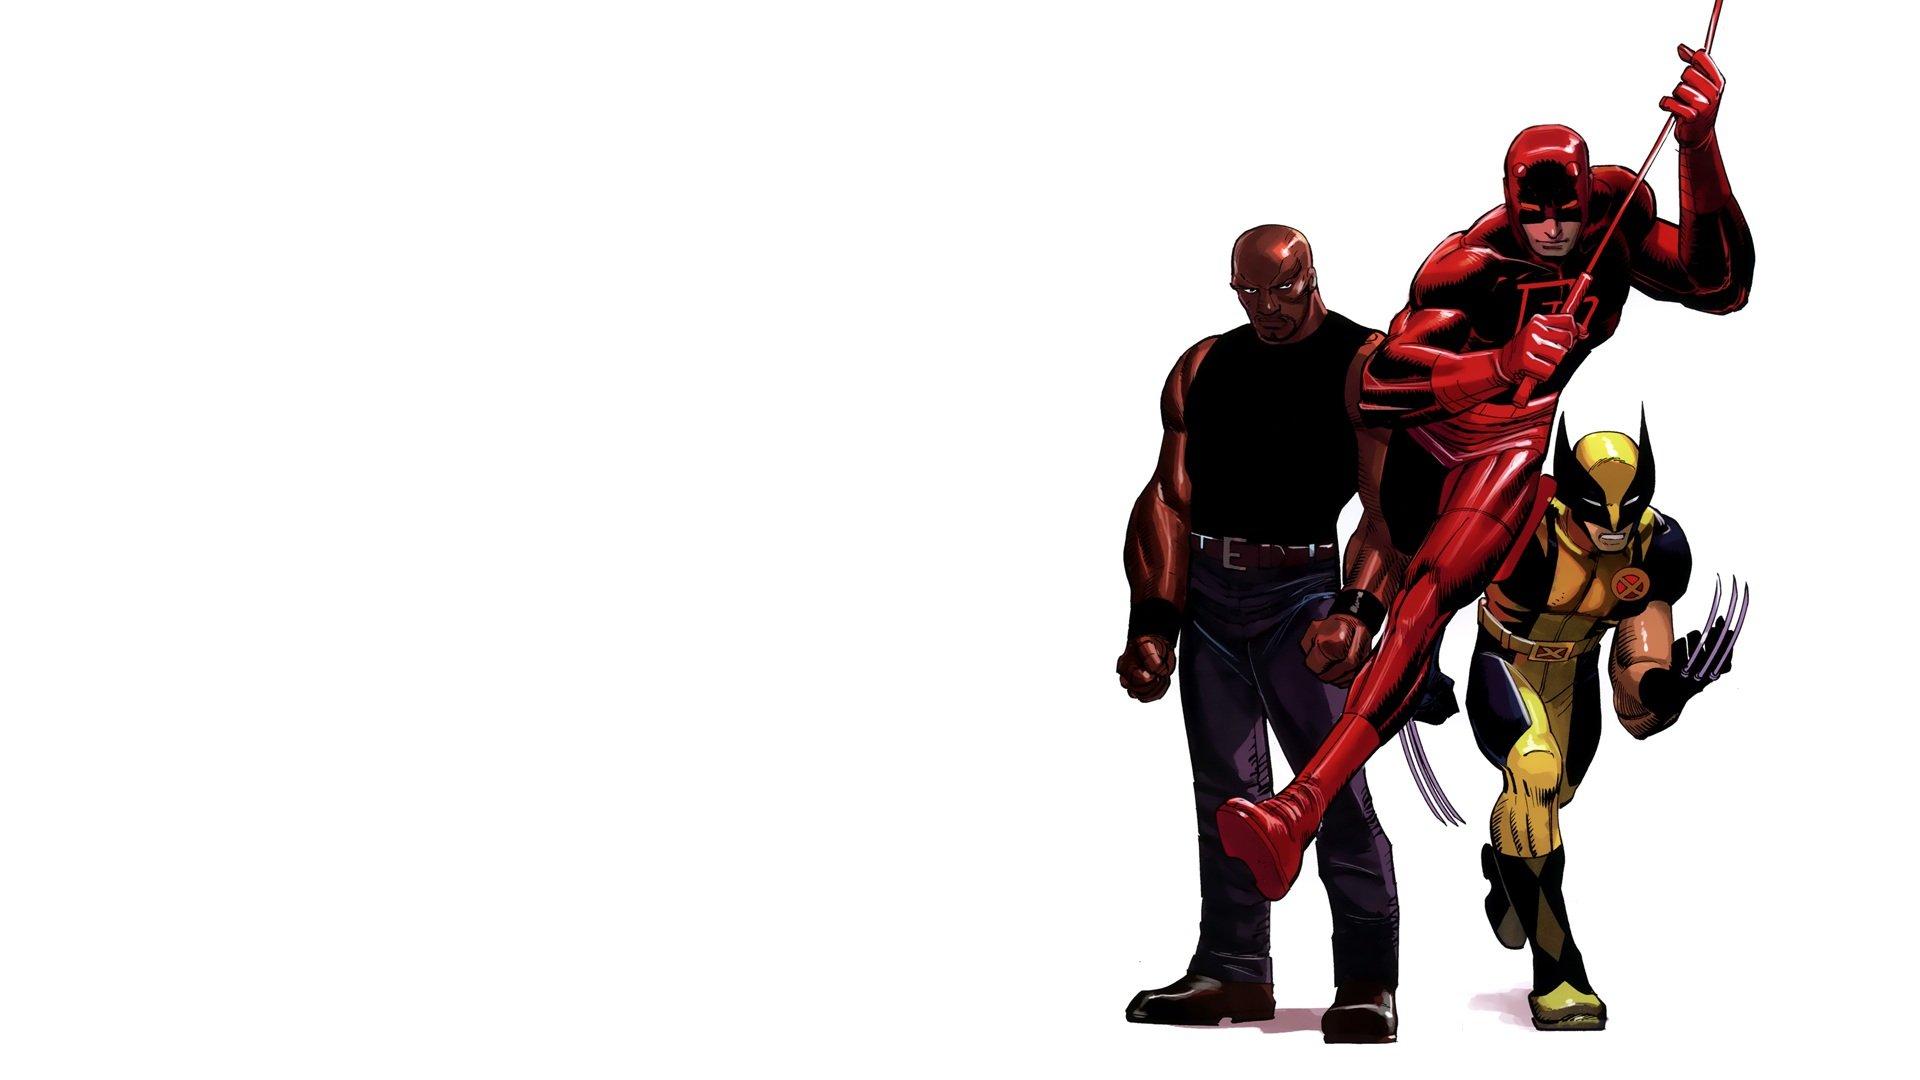 Comics Wolverine Daredevil Marvel Comics simple background 1920x1080